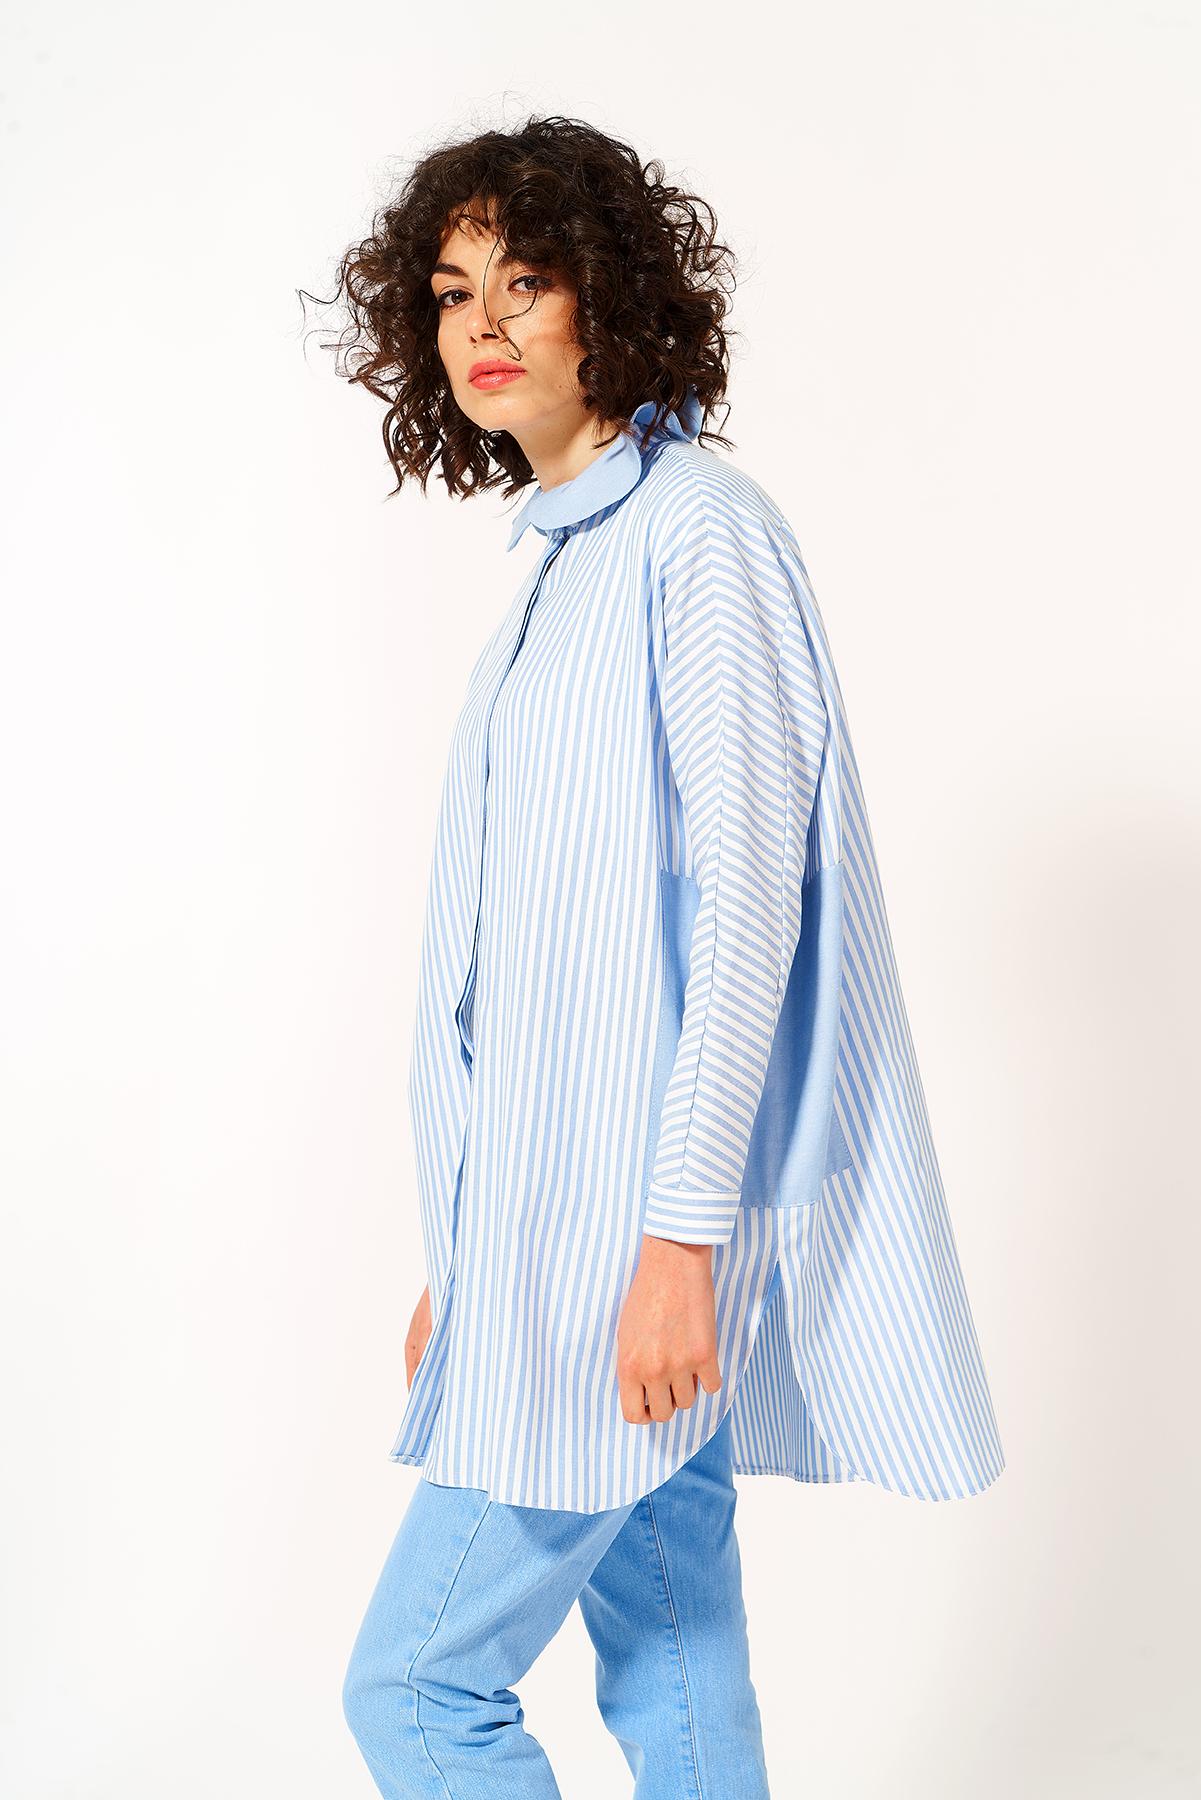 Mevra - Fırfır Yaka Tunik Mavi